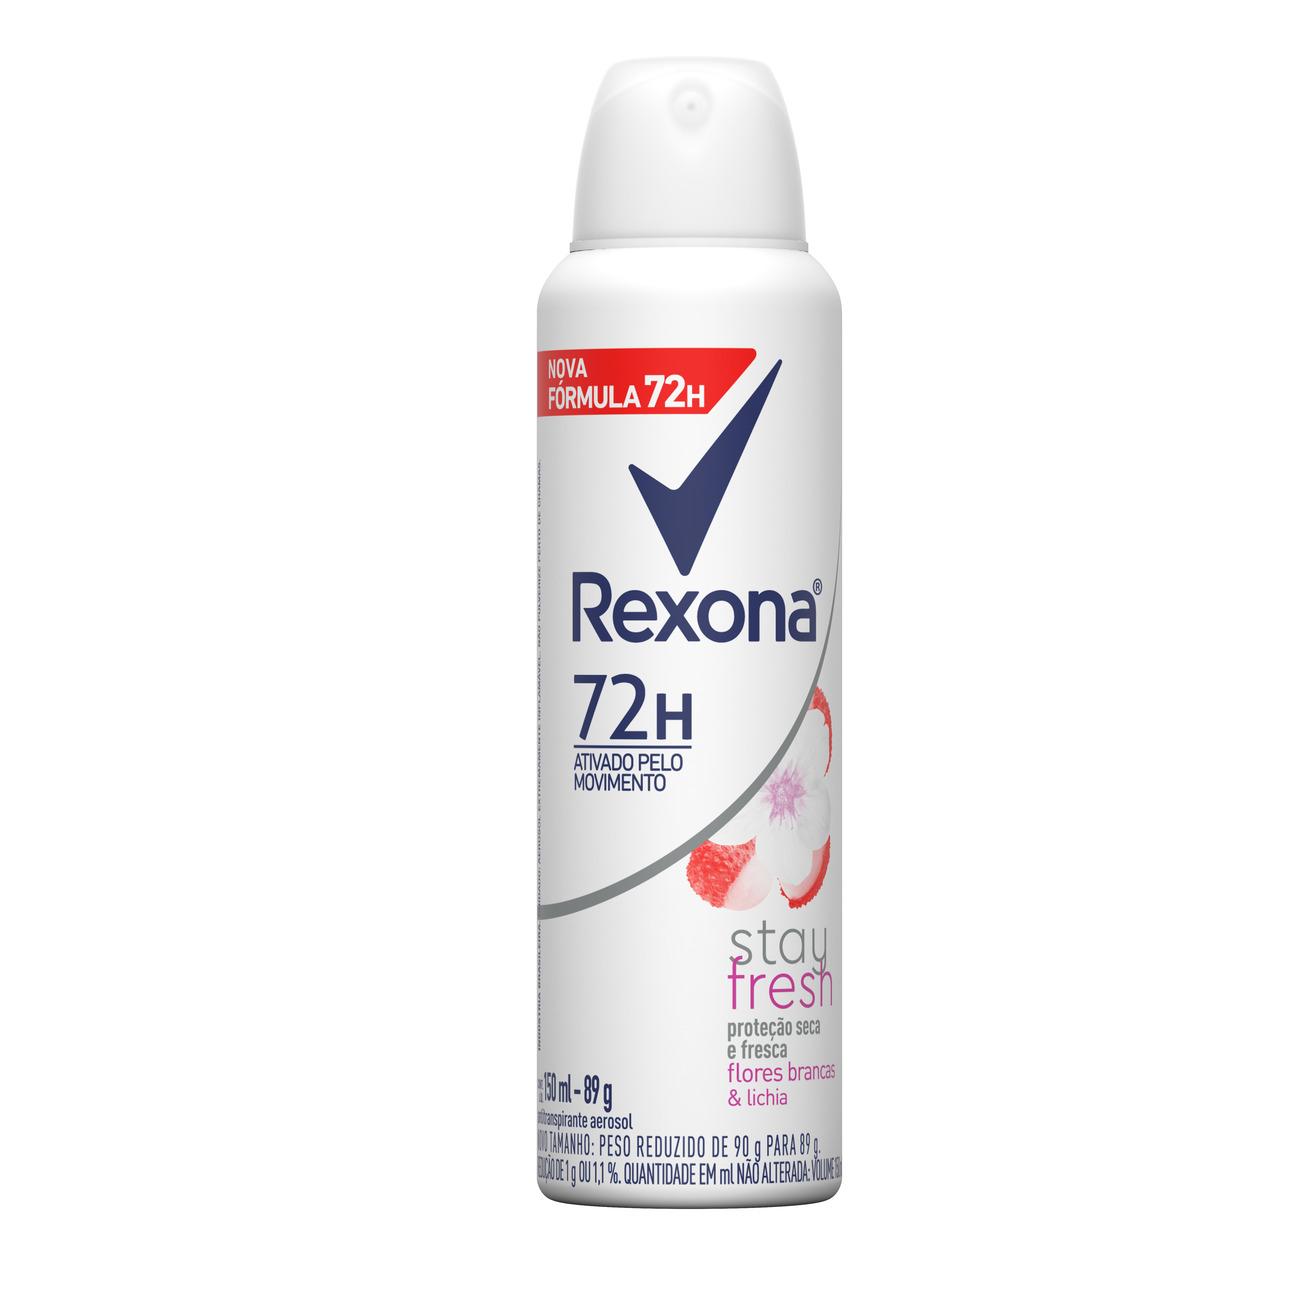 Desodorante Antitranspirante Rexona Feminino Aerosol Flores Brancas e Lichia 72 horas 150mL